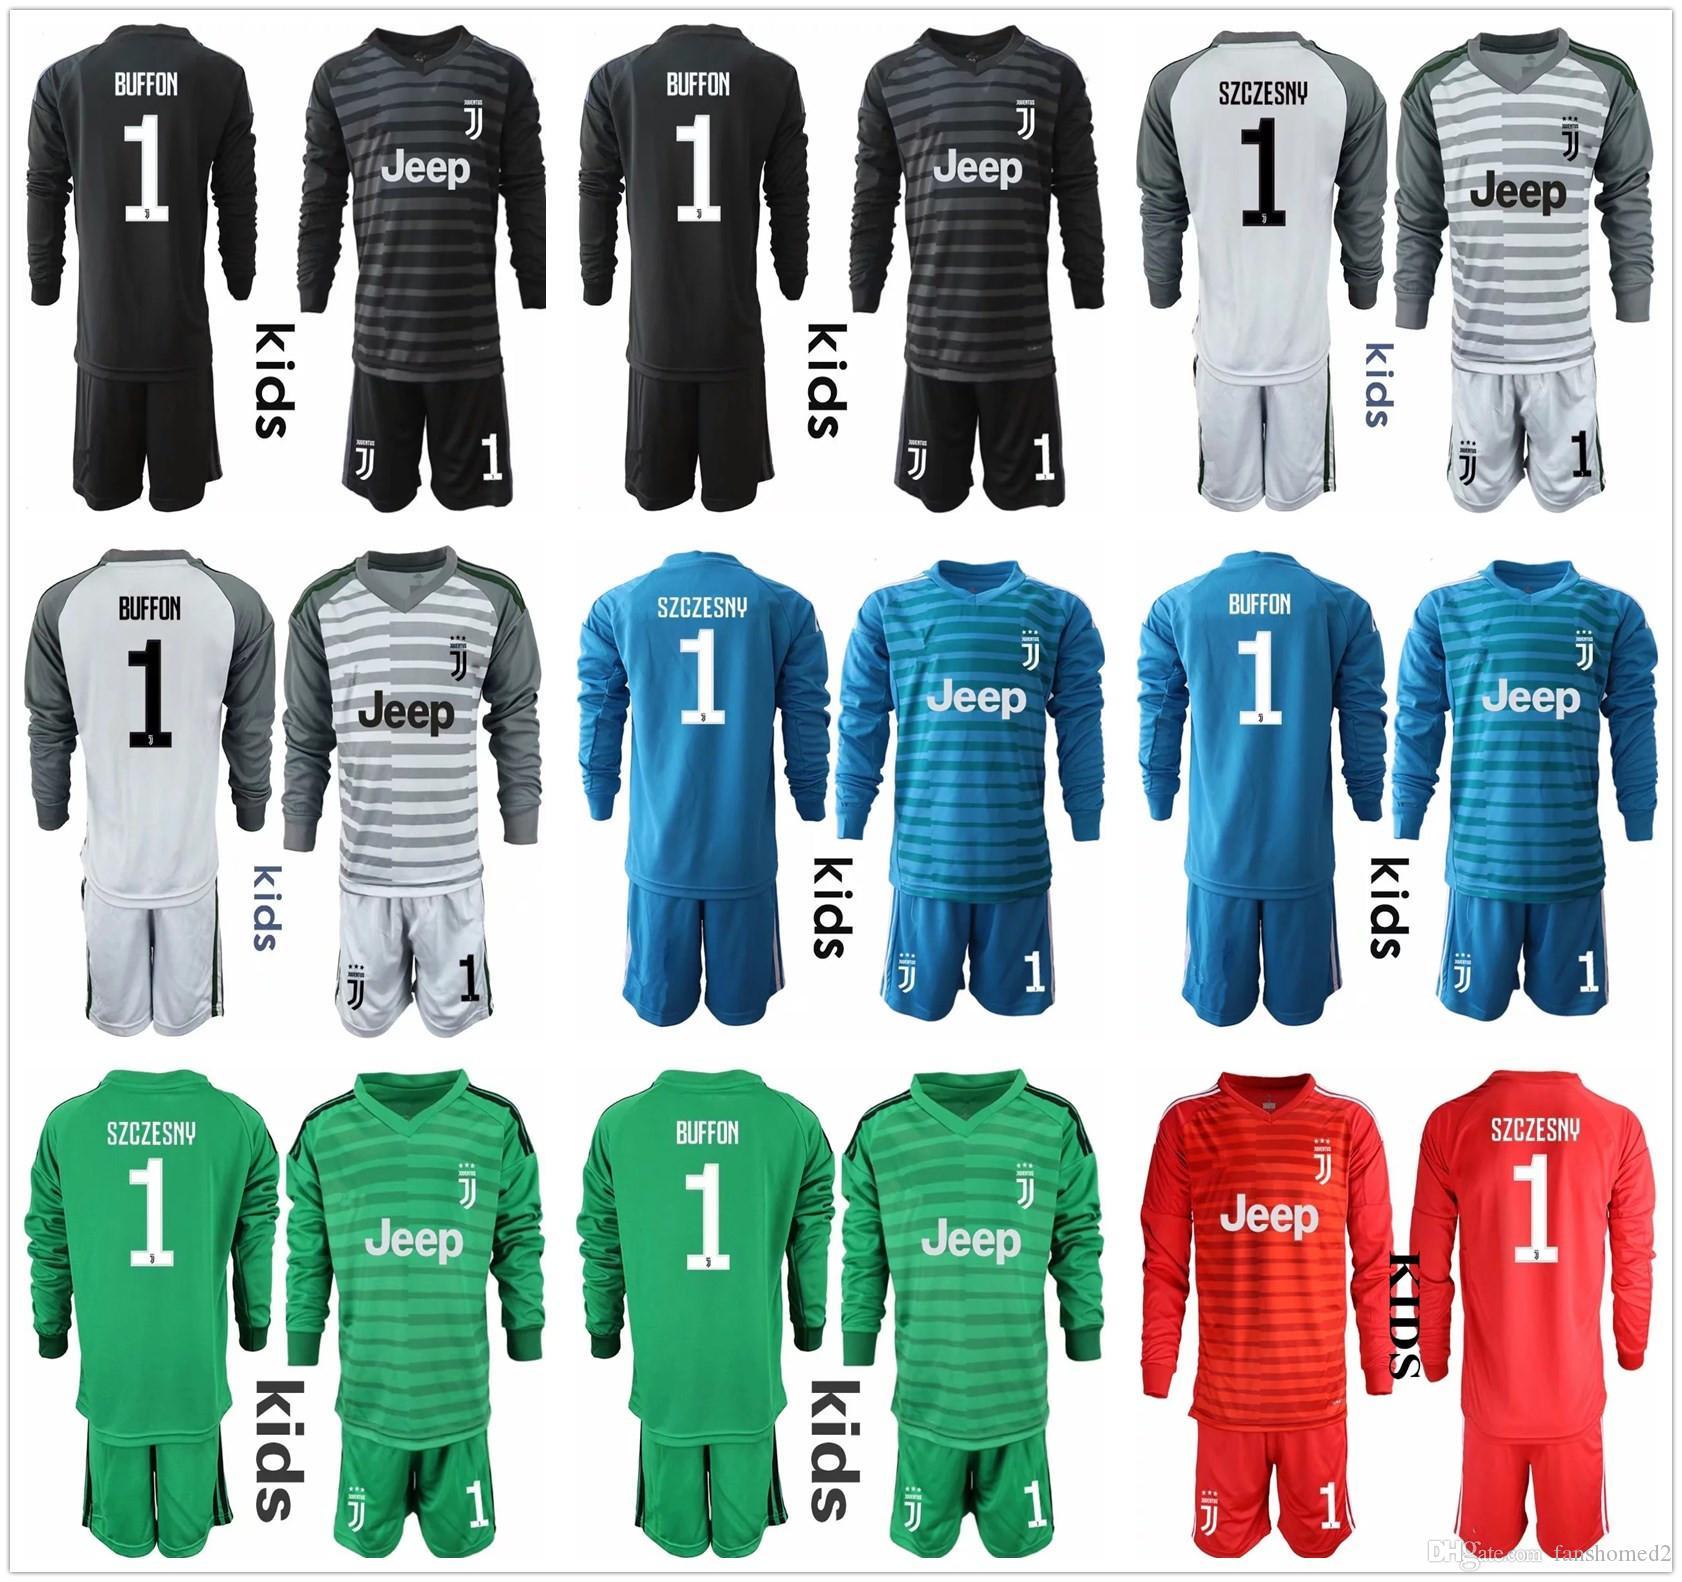 2cbf7fa22 2018 19 Youth Long Sleeve Juventus Goalkeeper Jerseys Kids Soccer Sets  1  Buffon Kid Goalkeeper Jerseys  1 Szczesny Children Boys Uniform UK 2019  From ...